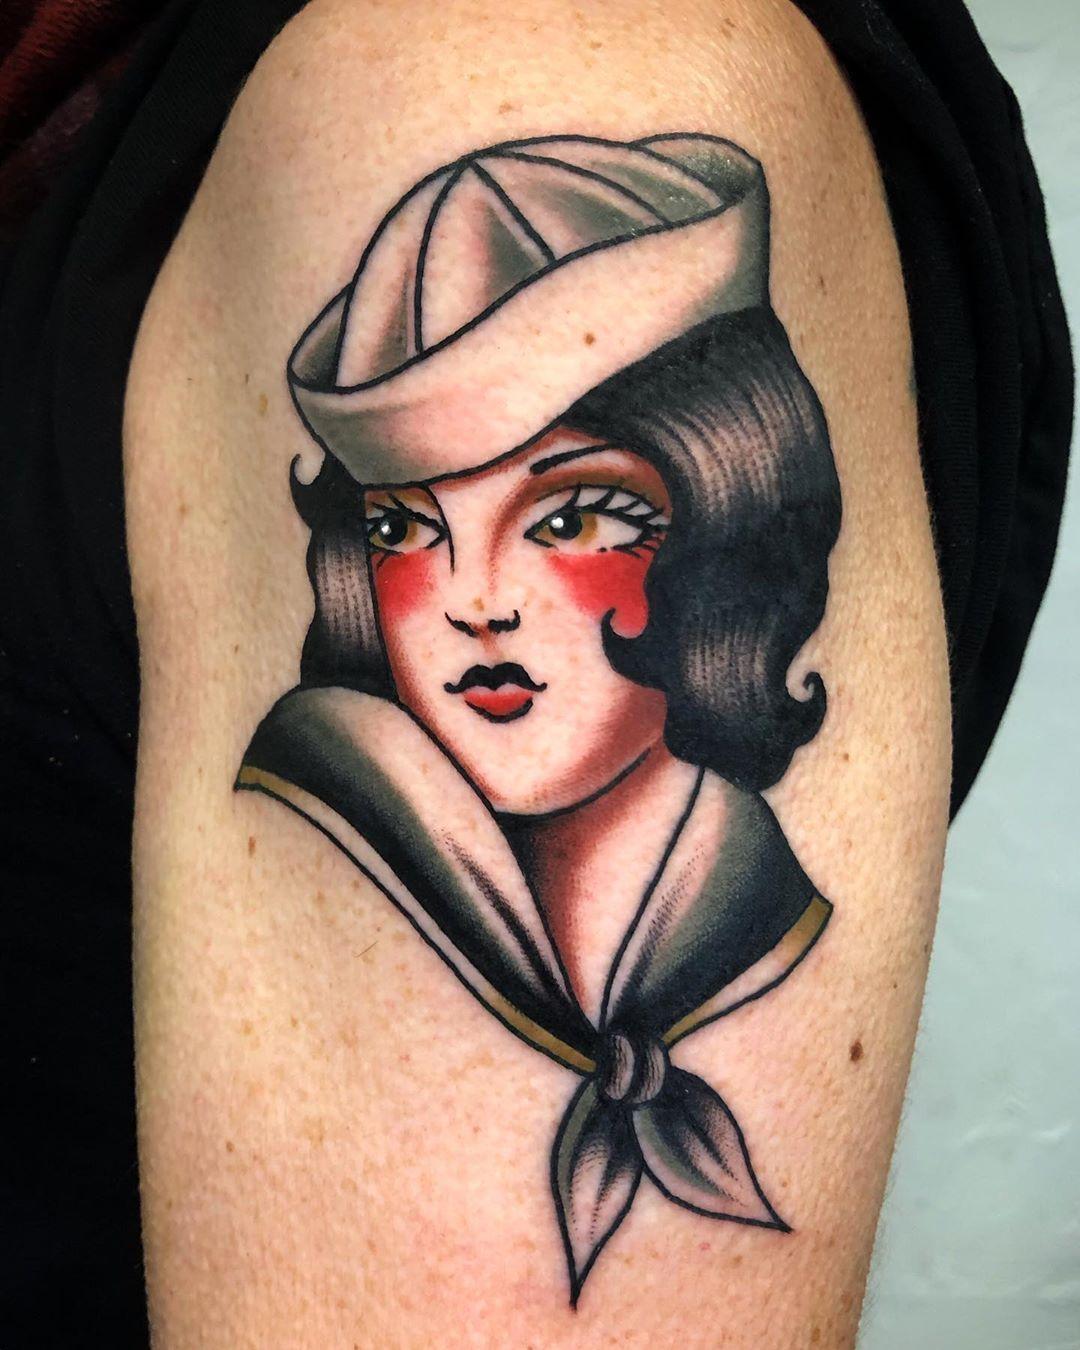 •Sailor• #tattoo #tattoos #tattooing #tattooist #tattooer #tattooink #tattooart #tattooflash #tattooideas #tattoodesign #traditional #colours #color #traditionalrosetattoo #traditionaltattoo #oldschool #oldschooltattoo #oldlines #bold #boldlines #indian #sailor #sailorwoman #fullcolor #traditionalsailor #sailortattoo #marinela #traditionaltattoospain #traditionalspain #greylinetattoo @david_larra_tattoo @greylinetattoo @traditionalspain